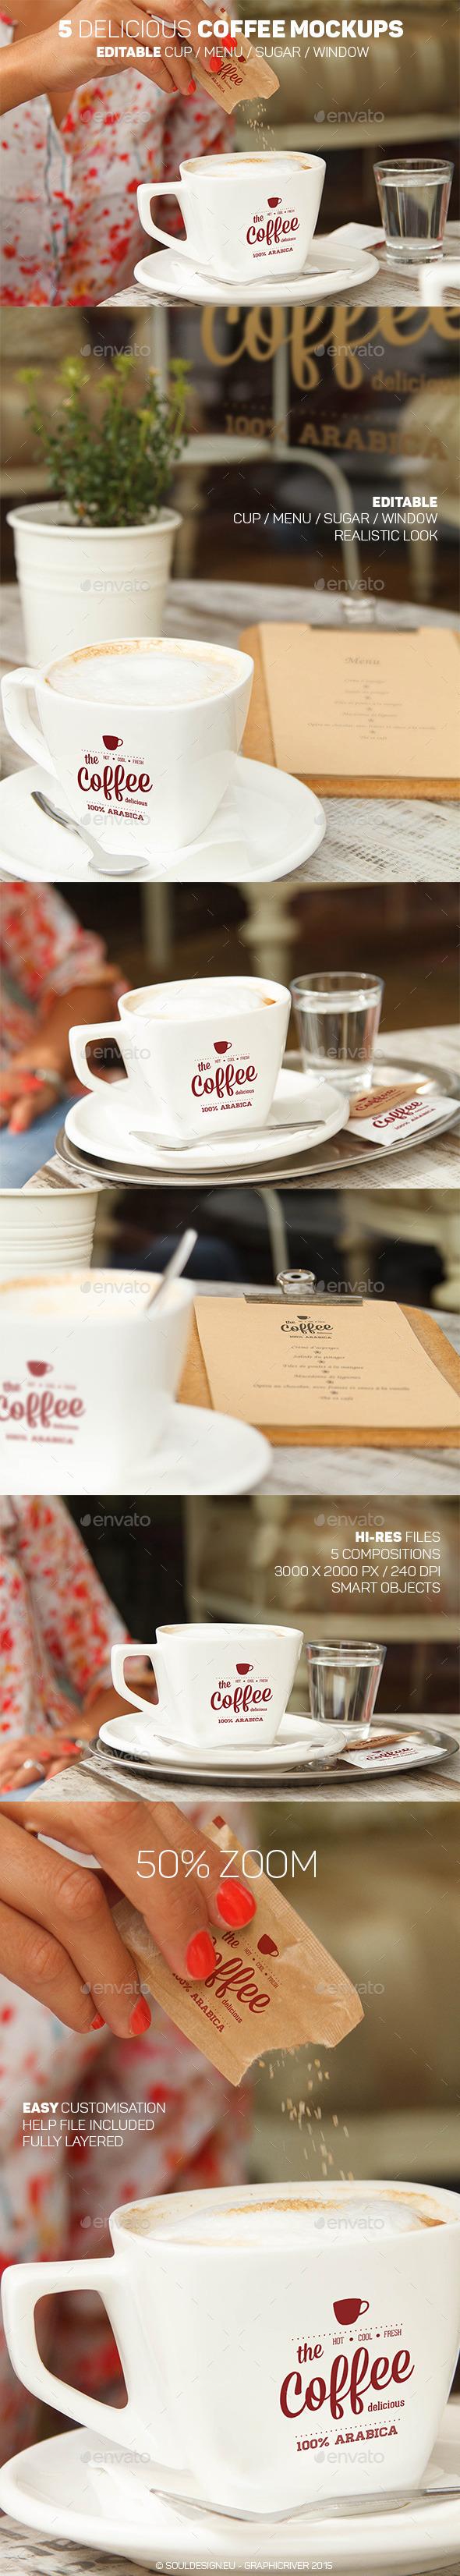 5 Delicious Coffee Mockups - Logo Product Mock-Ups